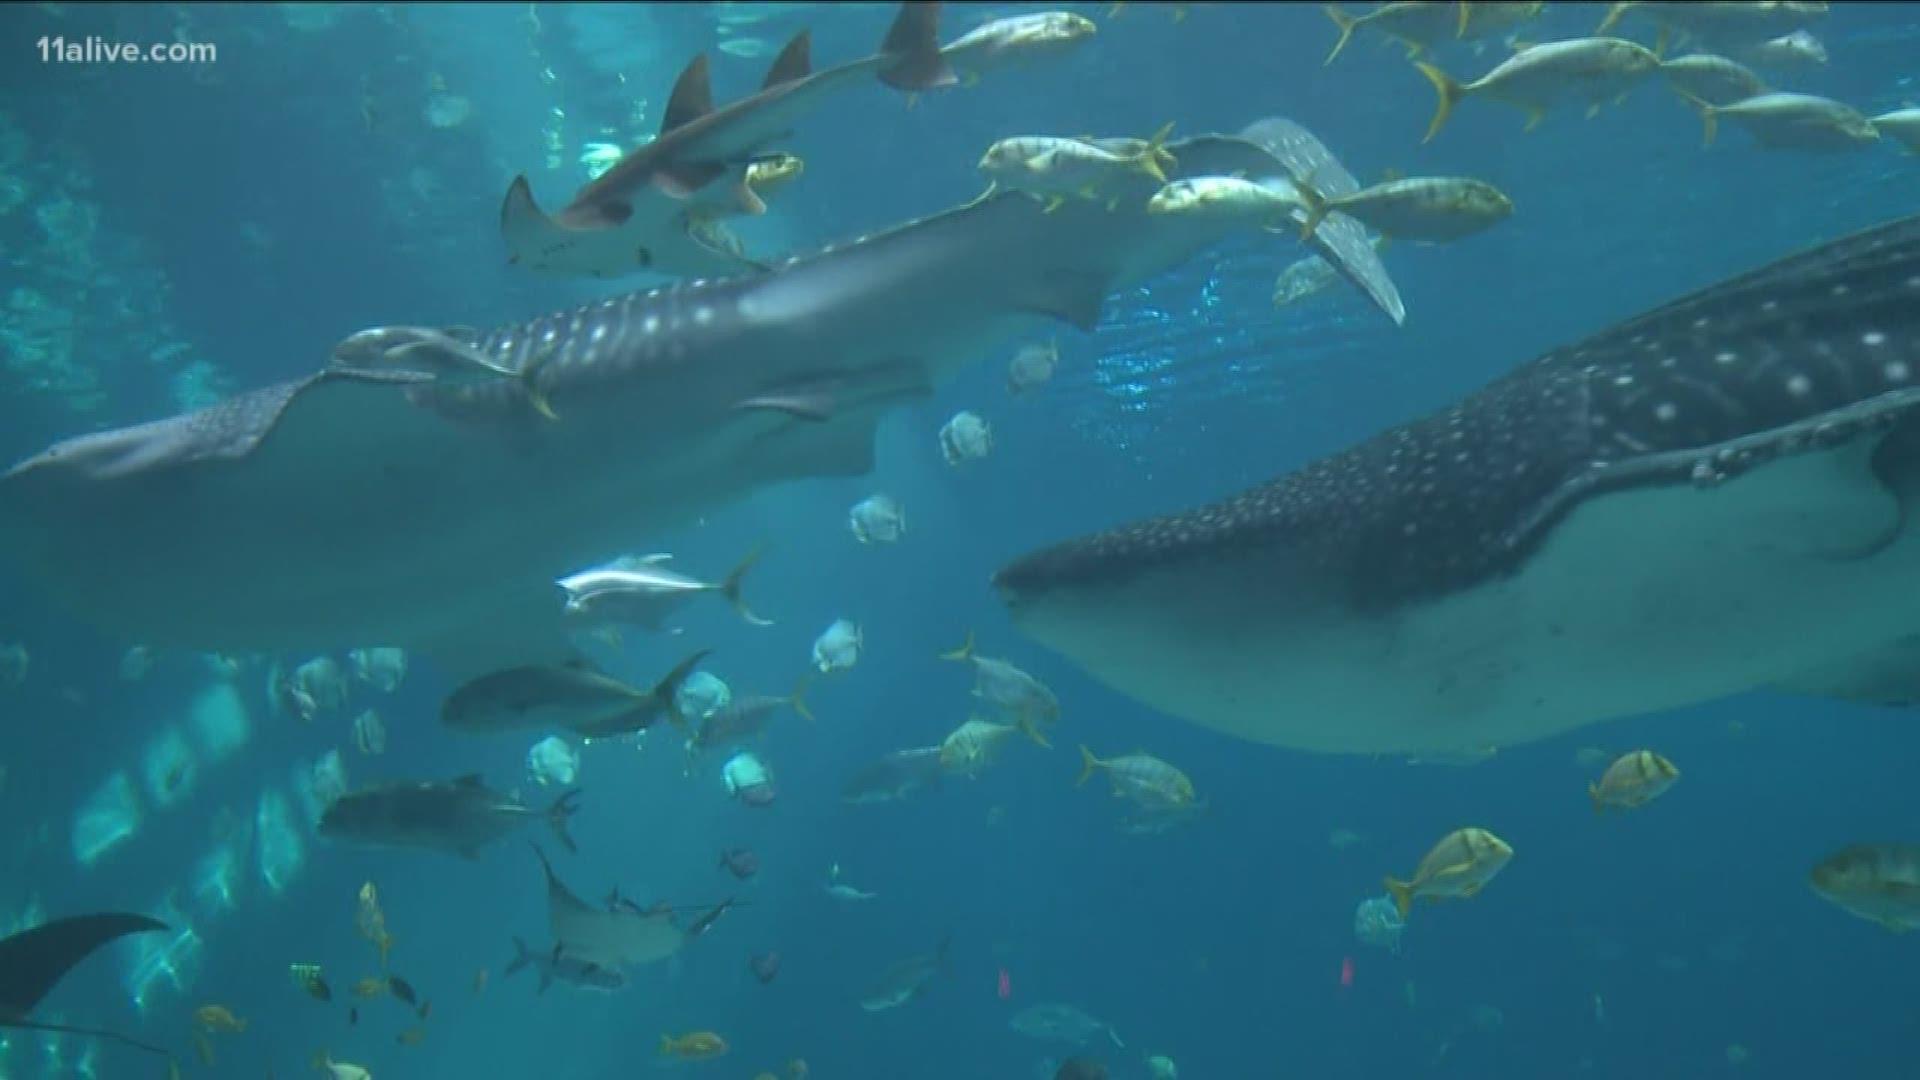 Georgia Aquarium whale shark Trixie dies   11alive.com